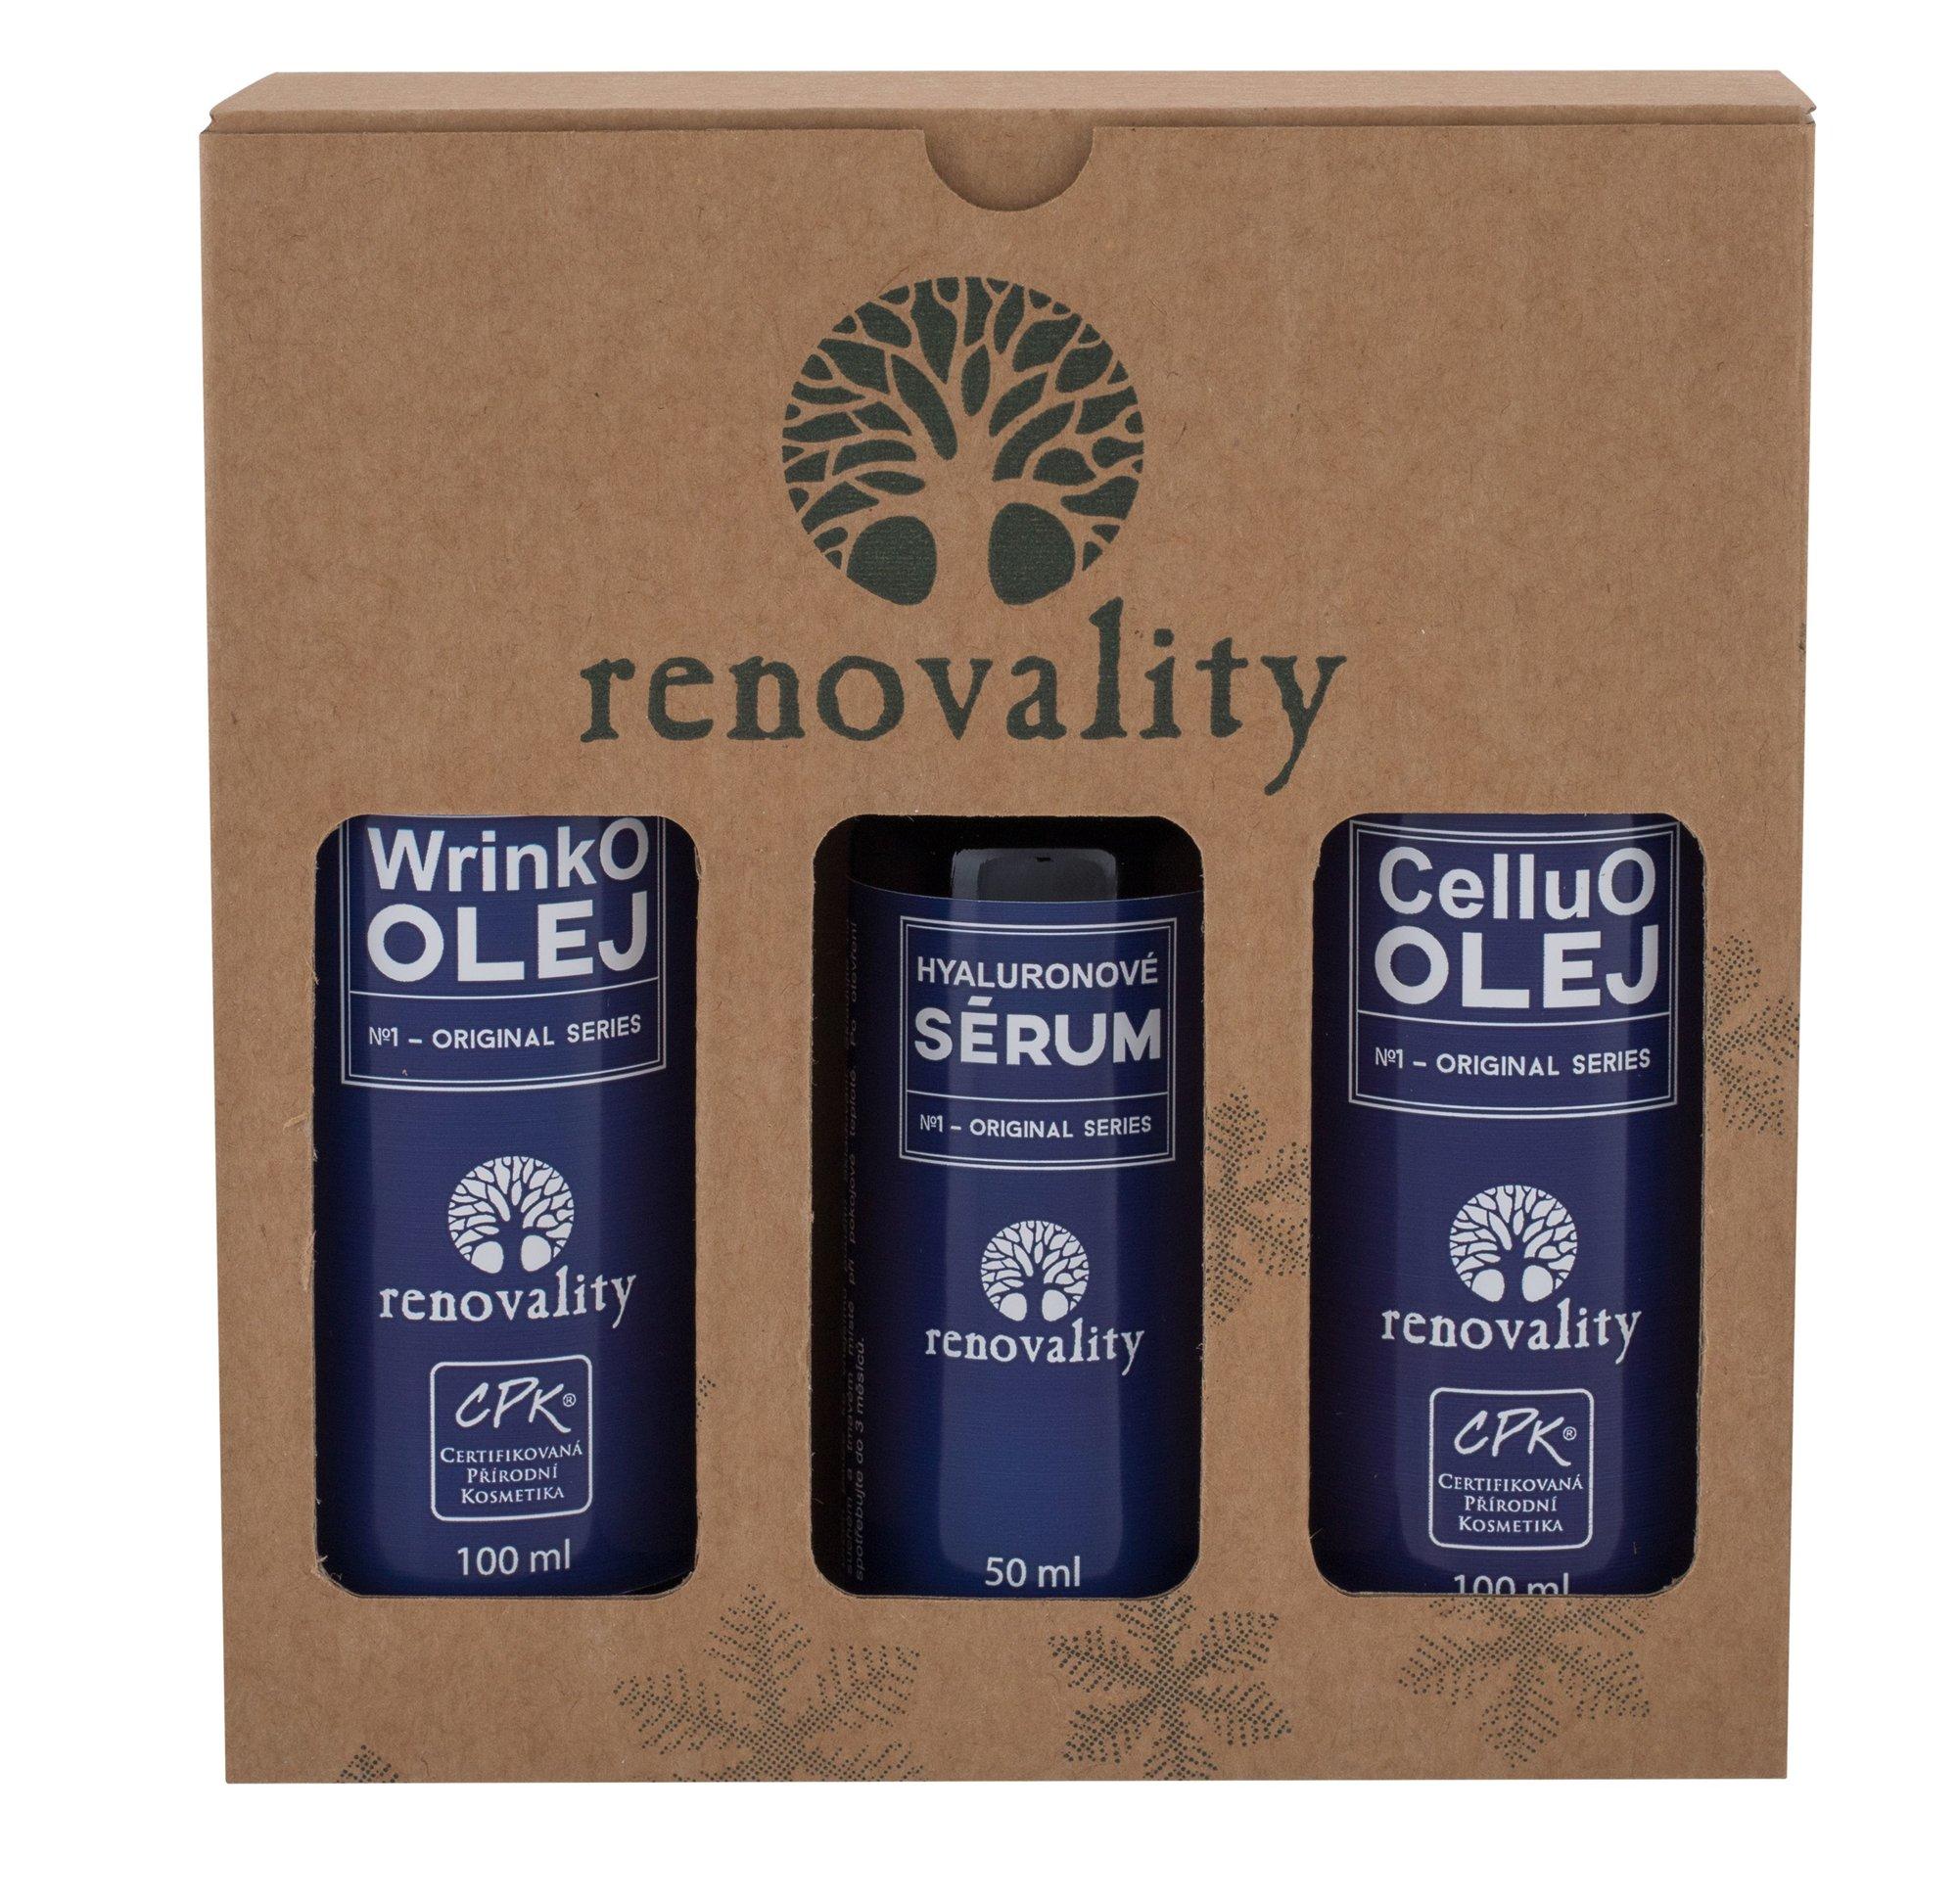 Renovality Original Series Body Oil 100ml  CelluO Oil